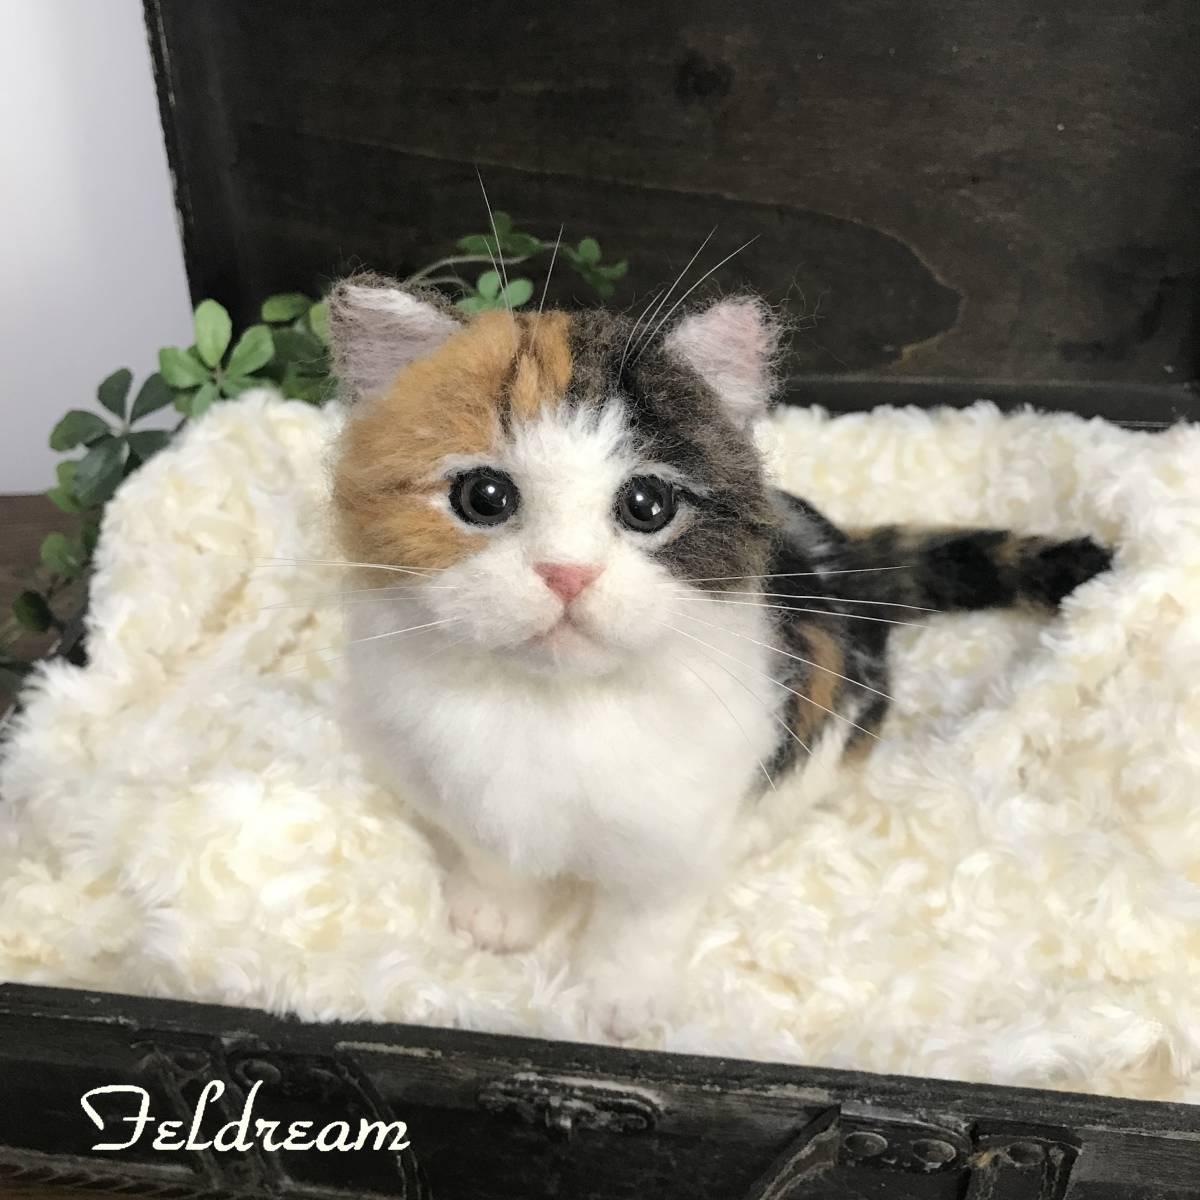 Feldream◆羊毛フェルト猫 可愛い三毛の子猫ちゃん スコティッシュ マンチカン キャリコ ハンドメイド 三毛猫